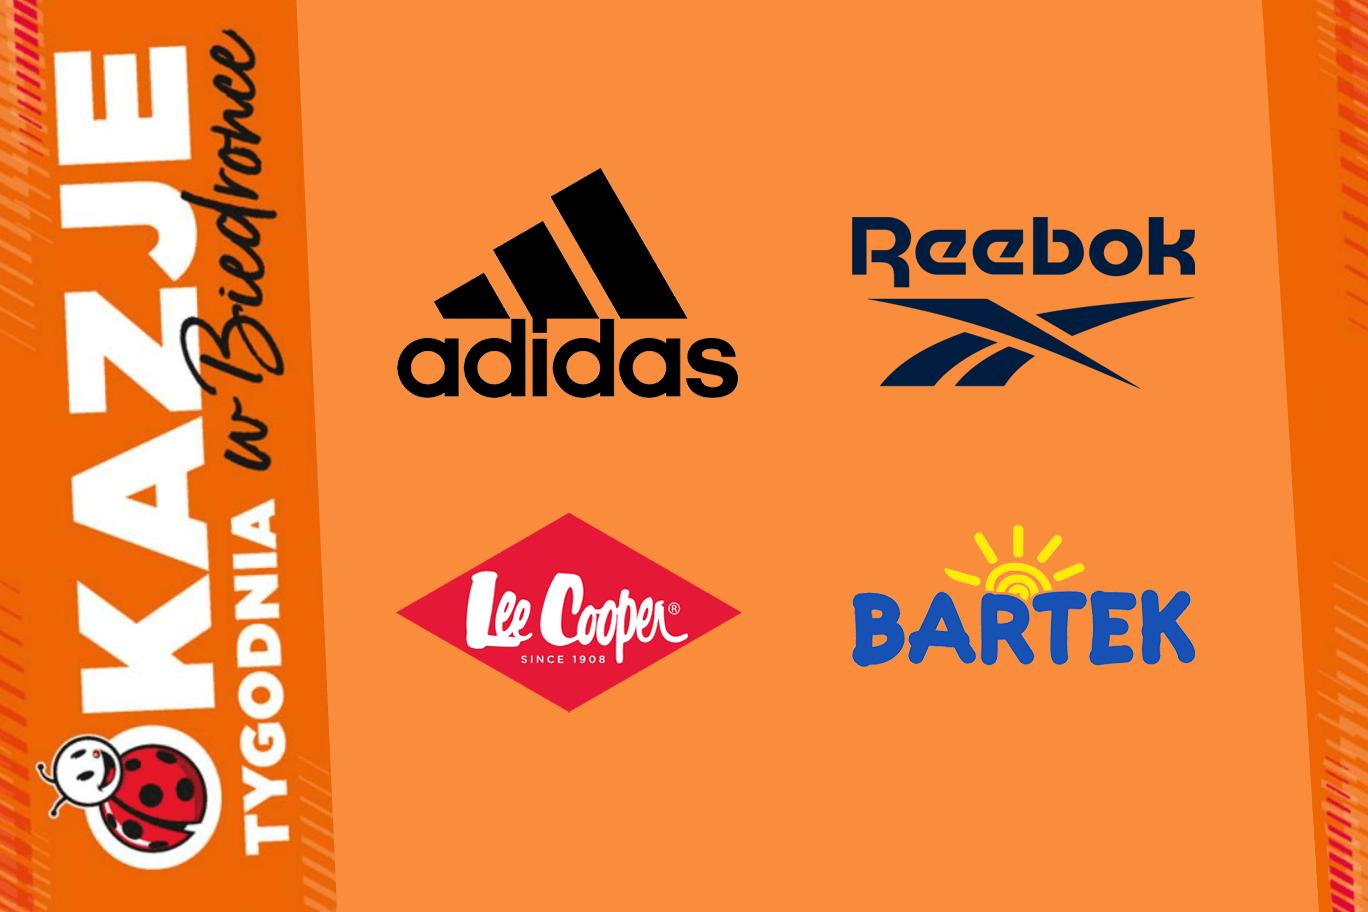 Adidas, Reebok, Lee Cooper – znane marki w Biedronce